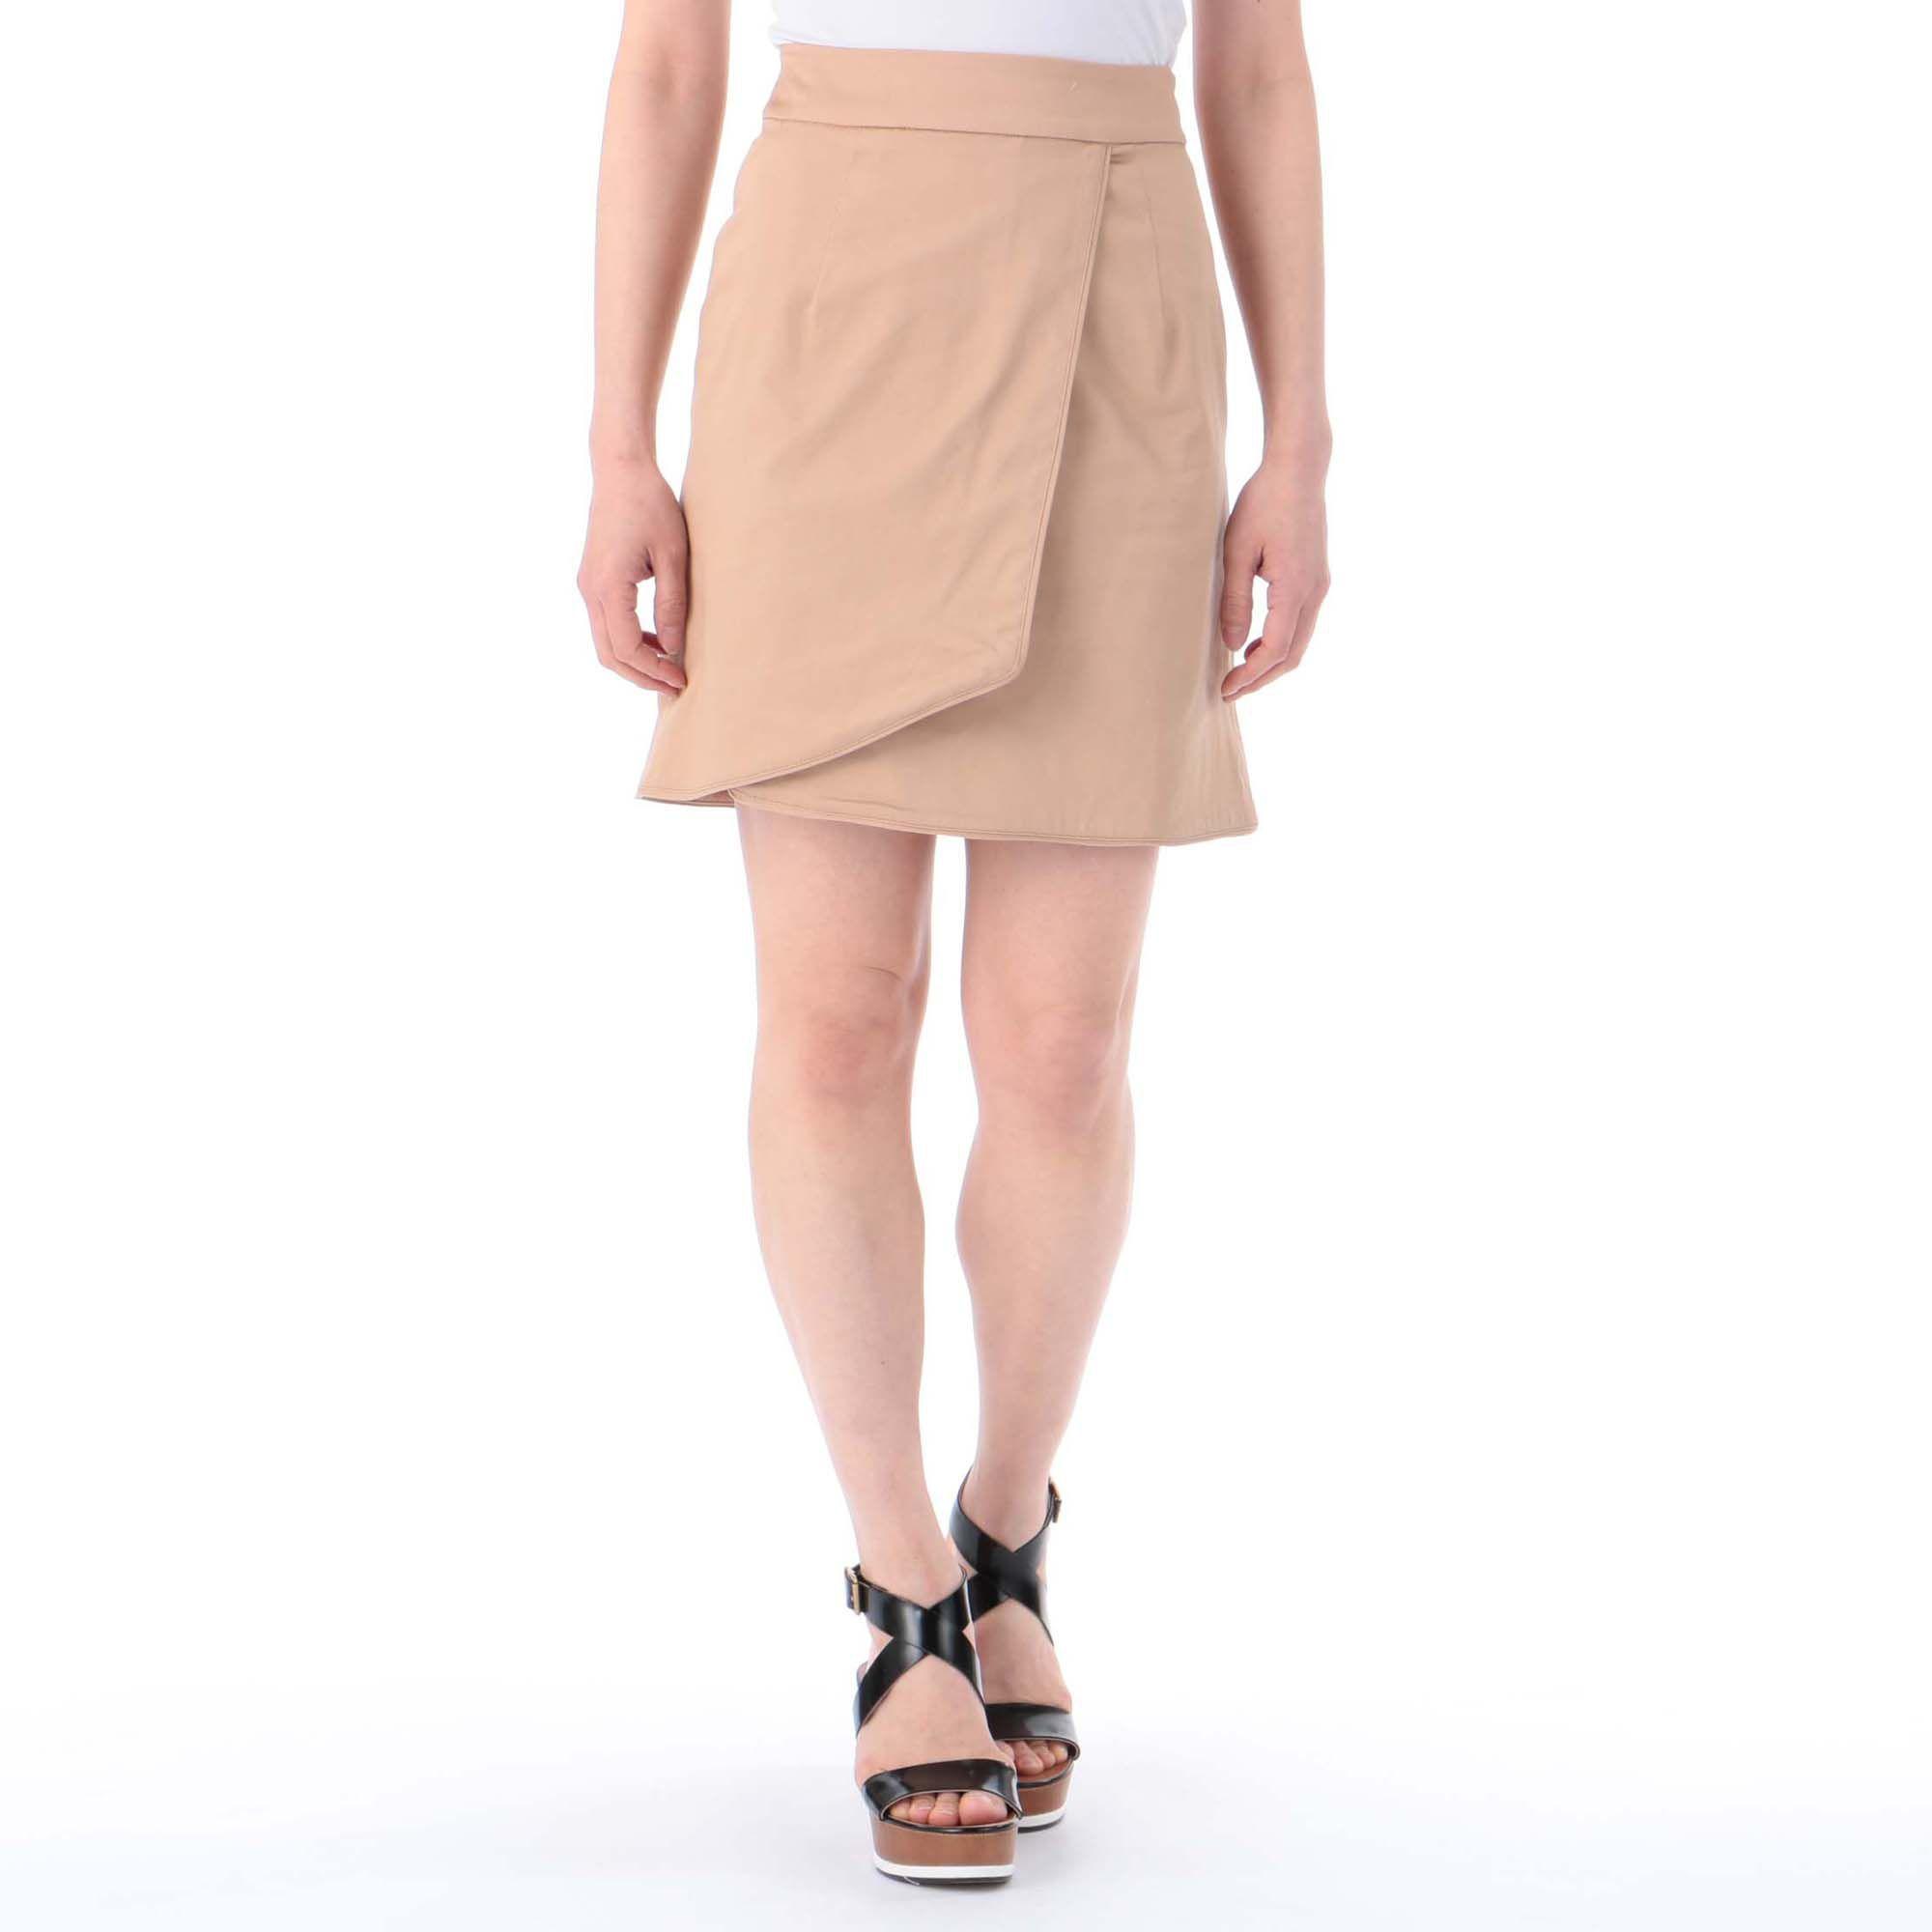 MERCURYDUOマーキュリーデュオ/サテンストレッチラップタイトスカート